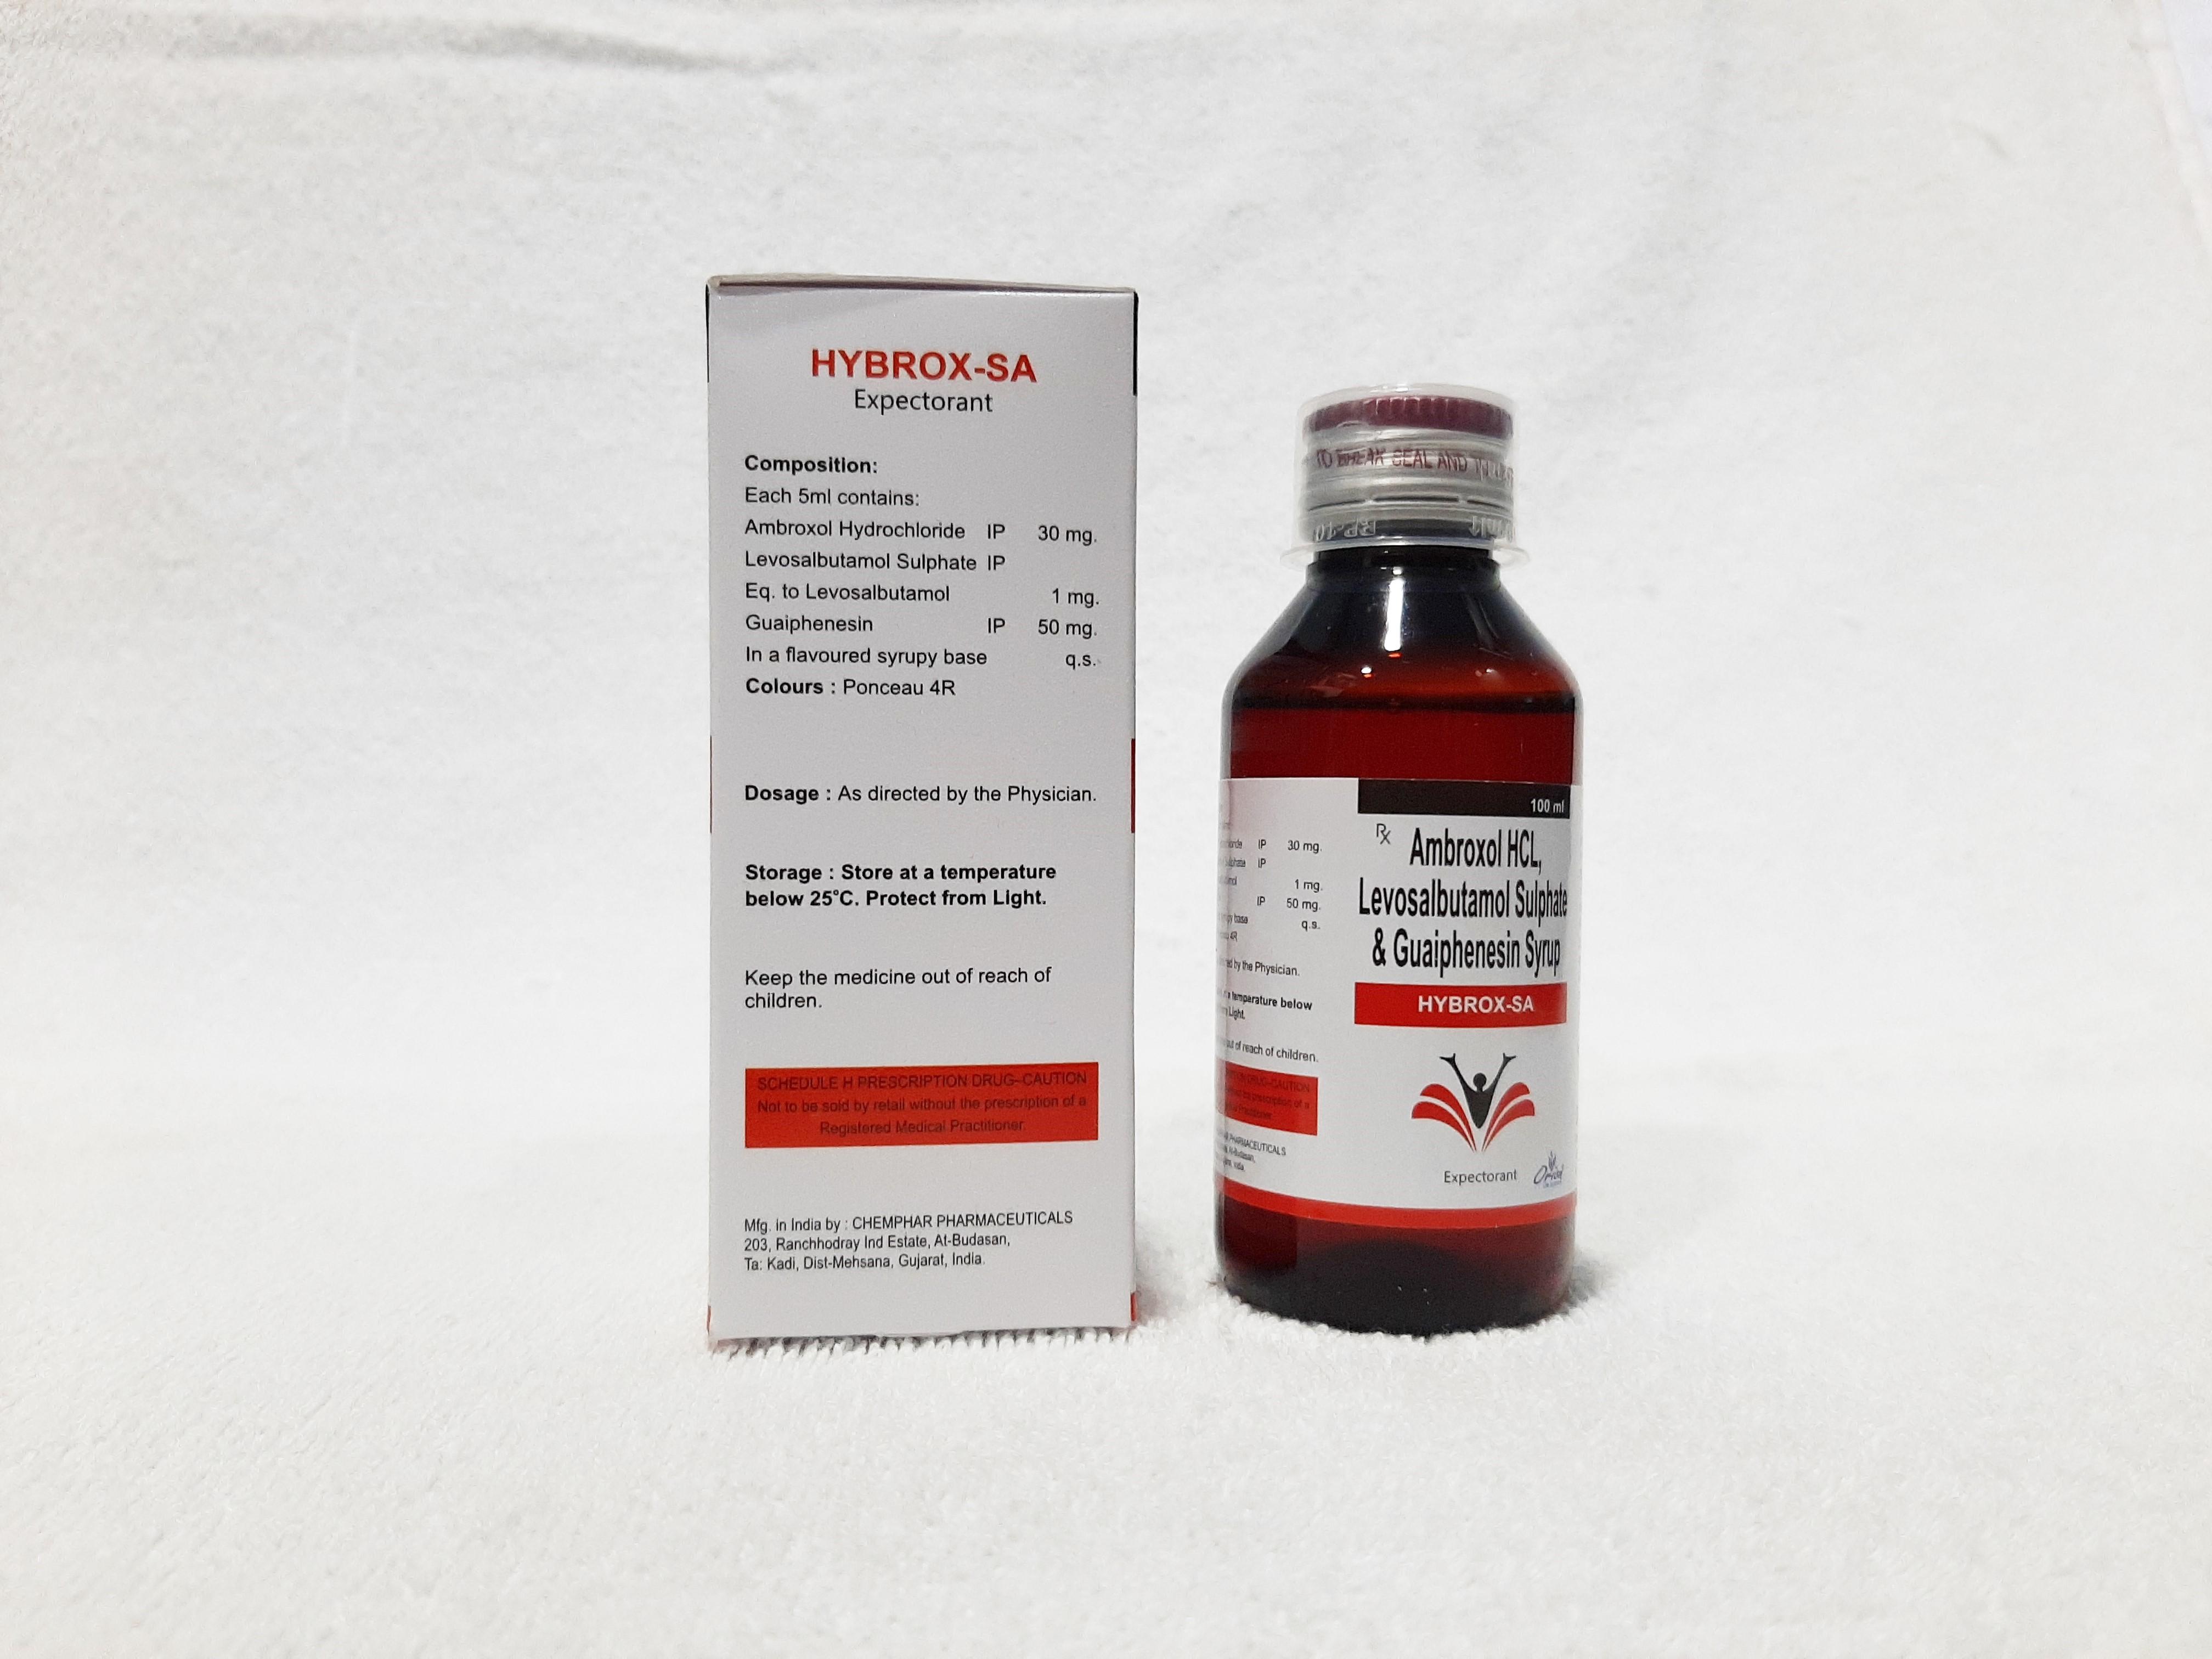 Ambroxol Hcl, Levosalbutamol & Guaiphenesin Syrup